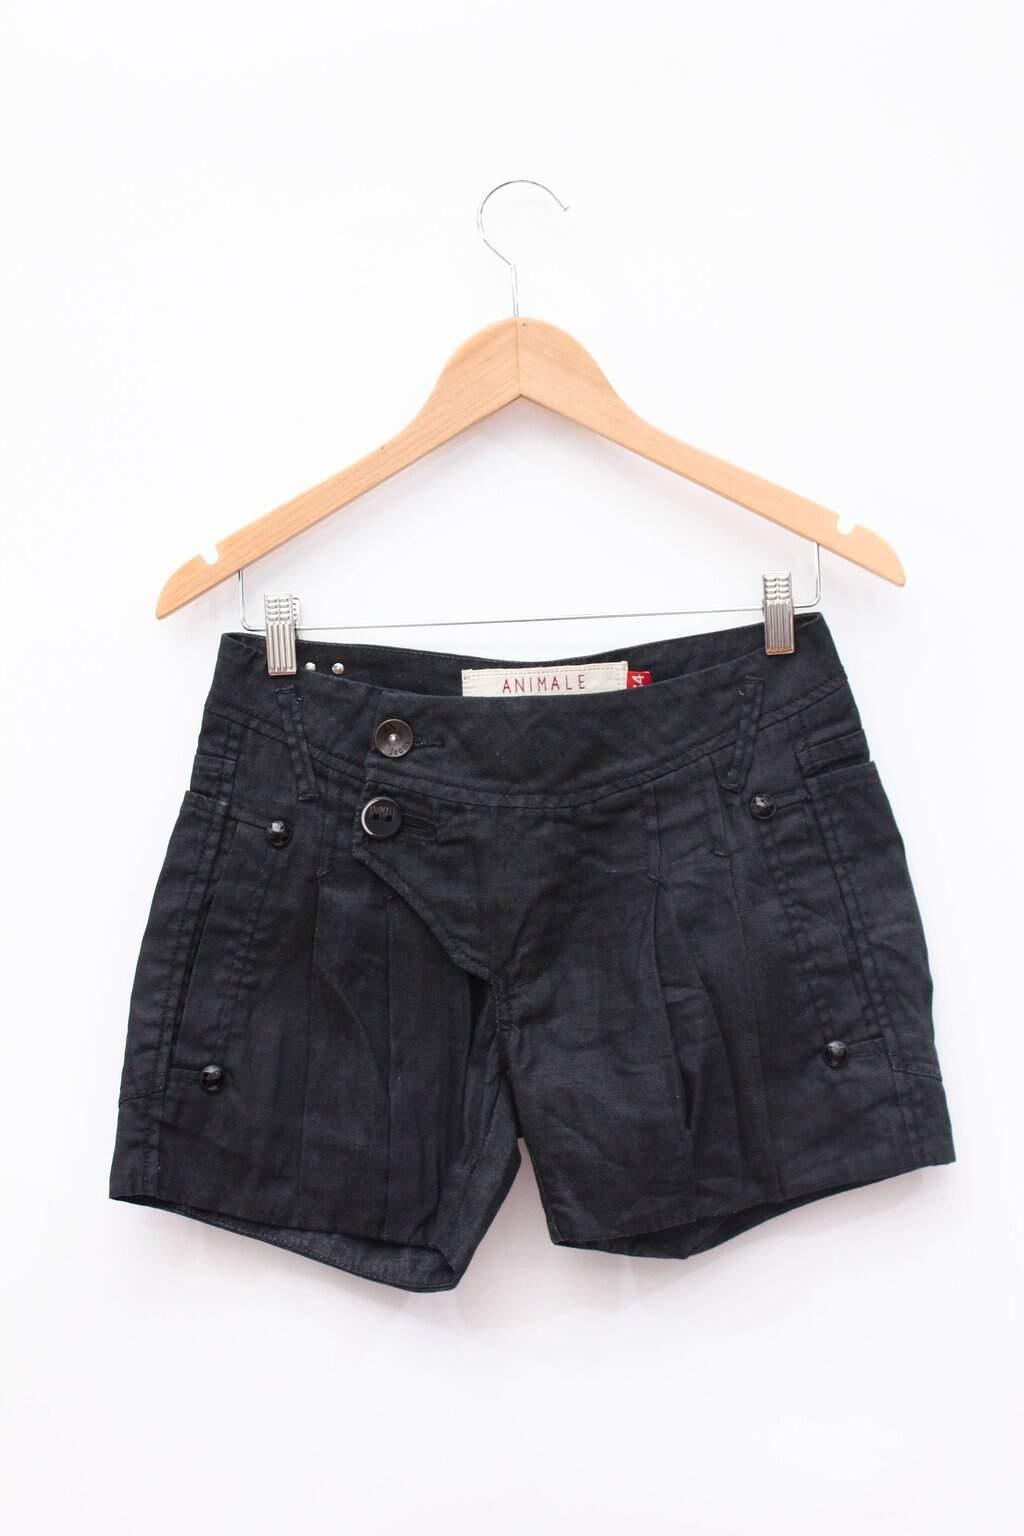 Shorts Jeans Preto Com Botões Animale